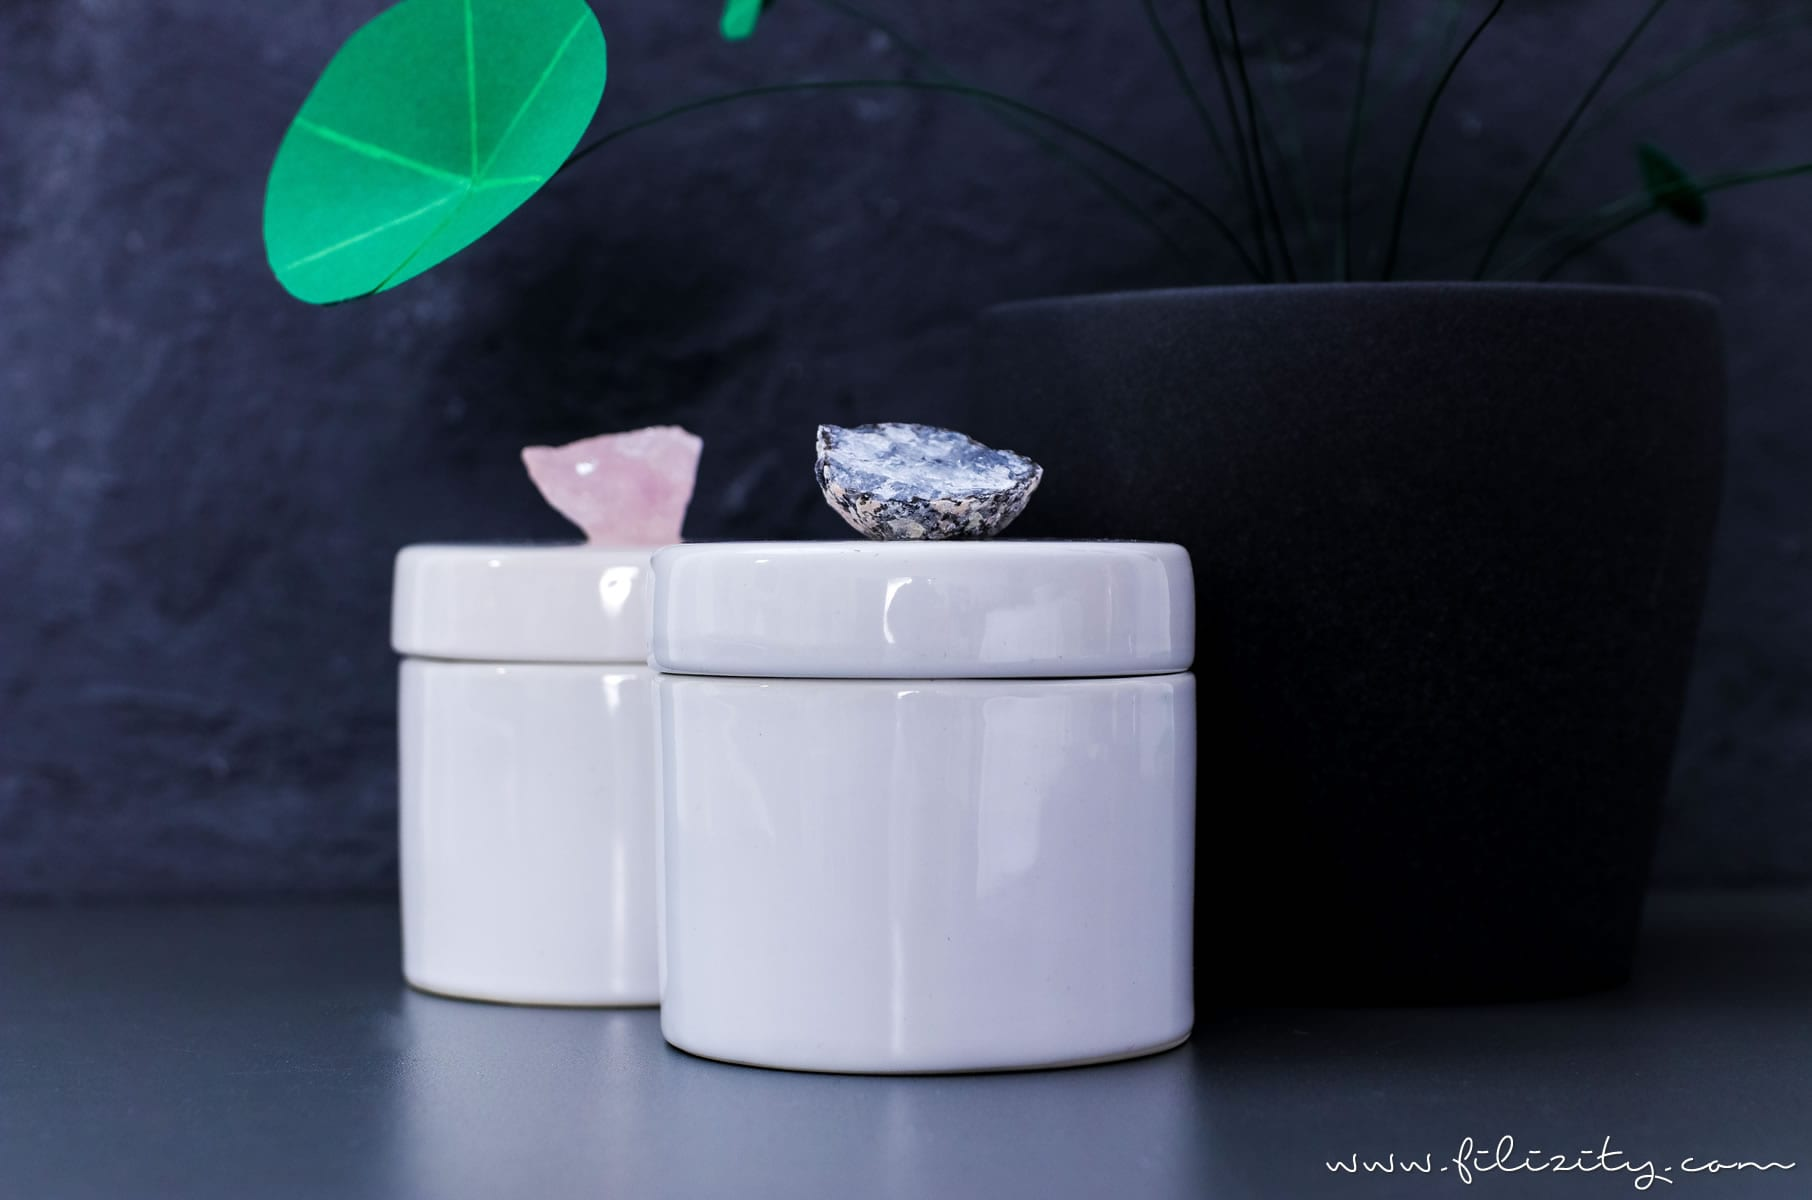 Luxus-Deko selber machen: DIY Kristalldosen